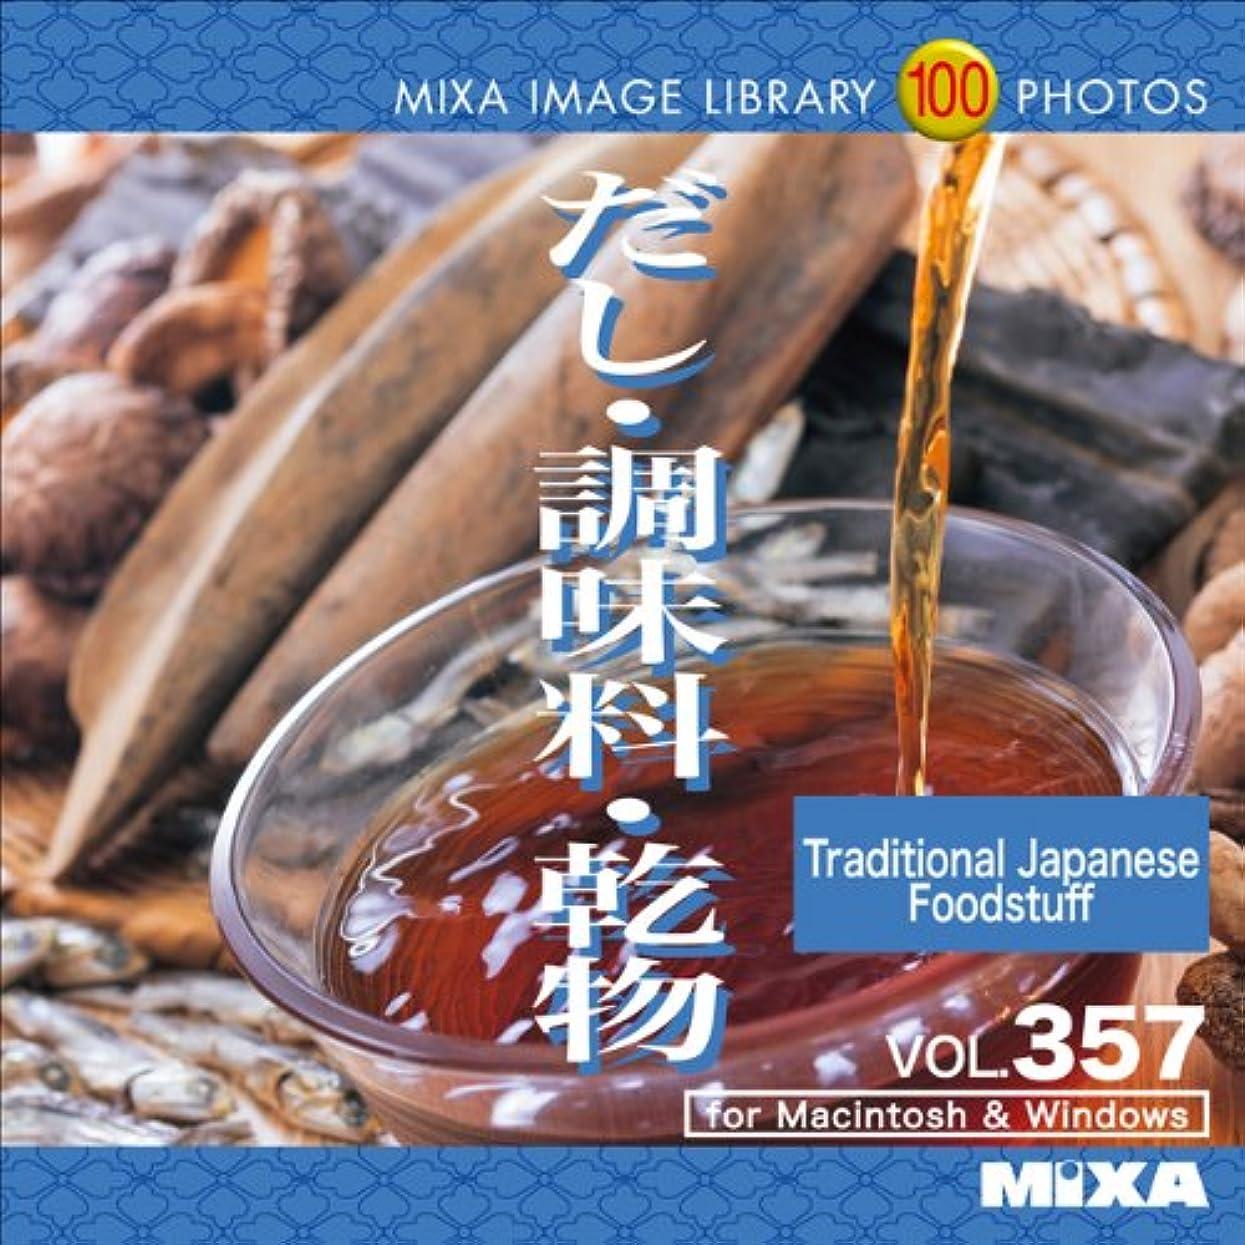 MIXA Image Library Vol.357 だし?調味料?乾物